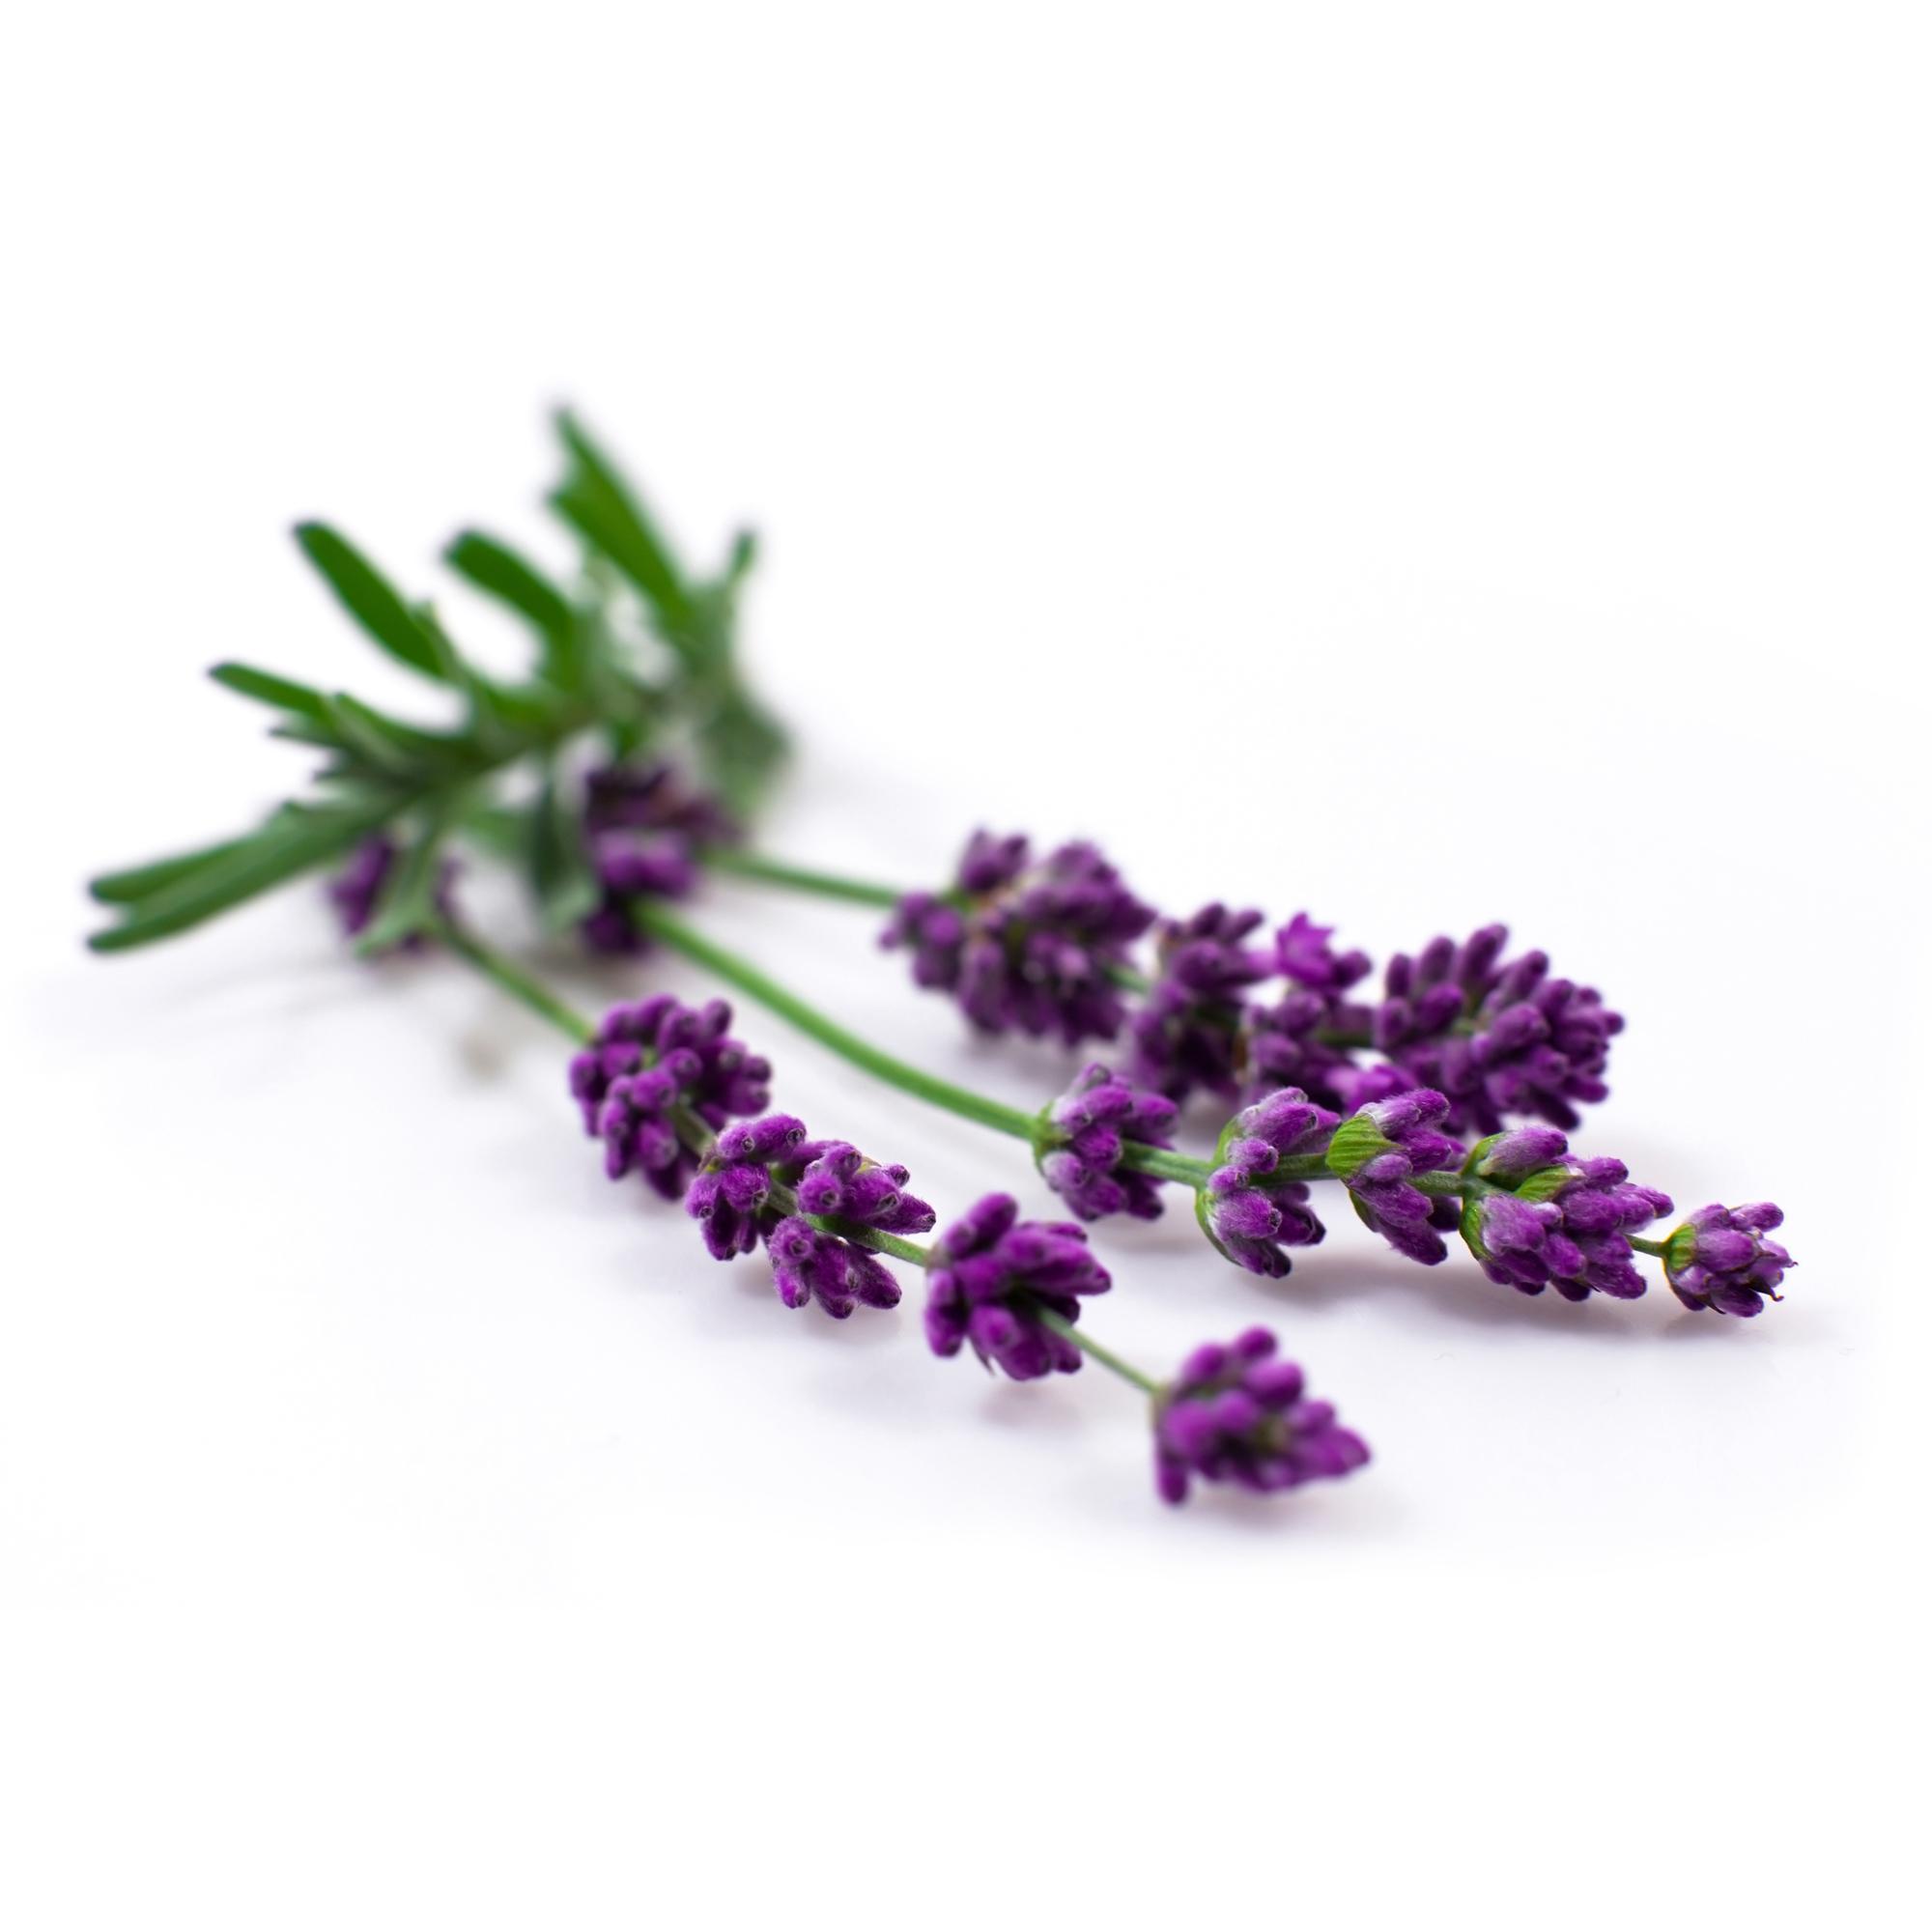 Bio Yoga mat cleaner - fresh lavender - 50 ml